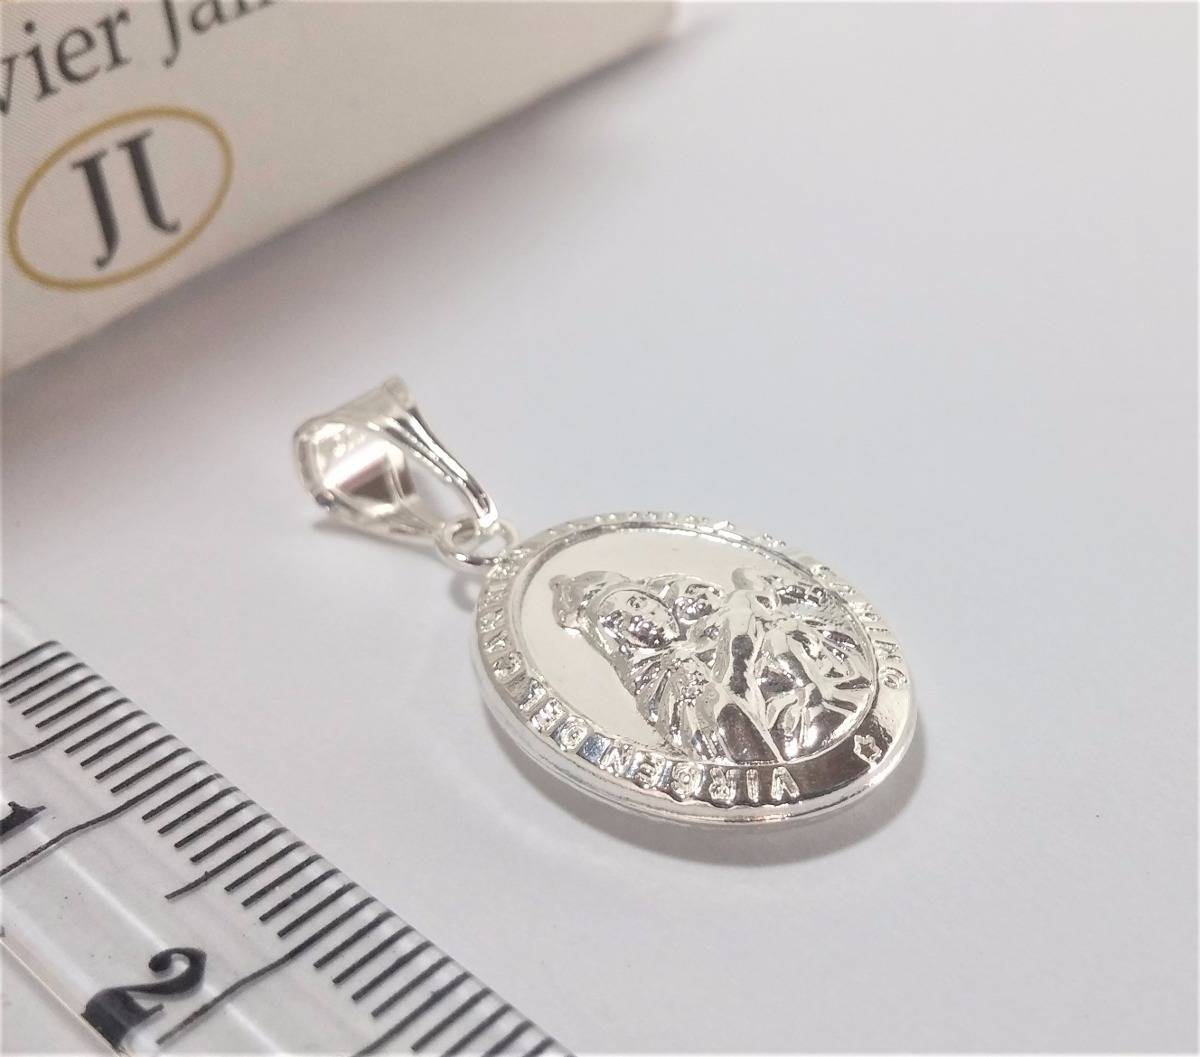 1bbd46e716e medalla virgen del carmen   sagrado corazon plata ley 925. Cargando zoom.